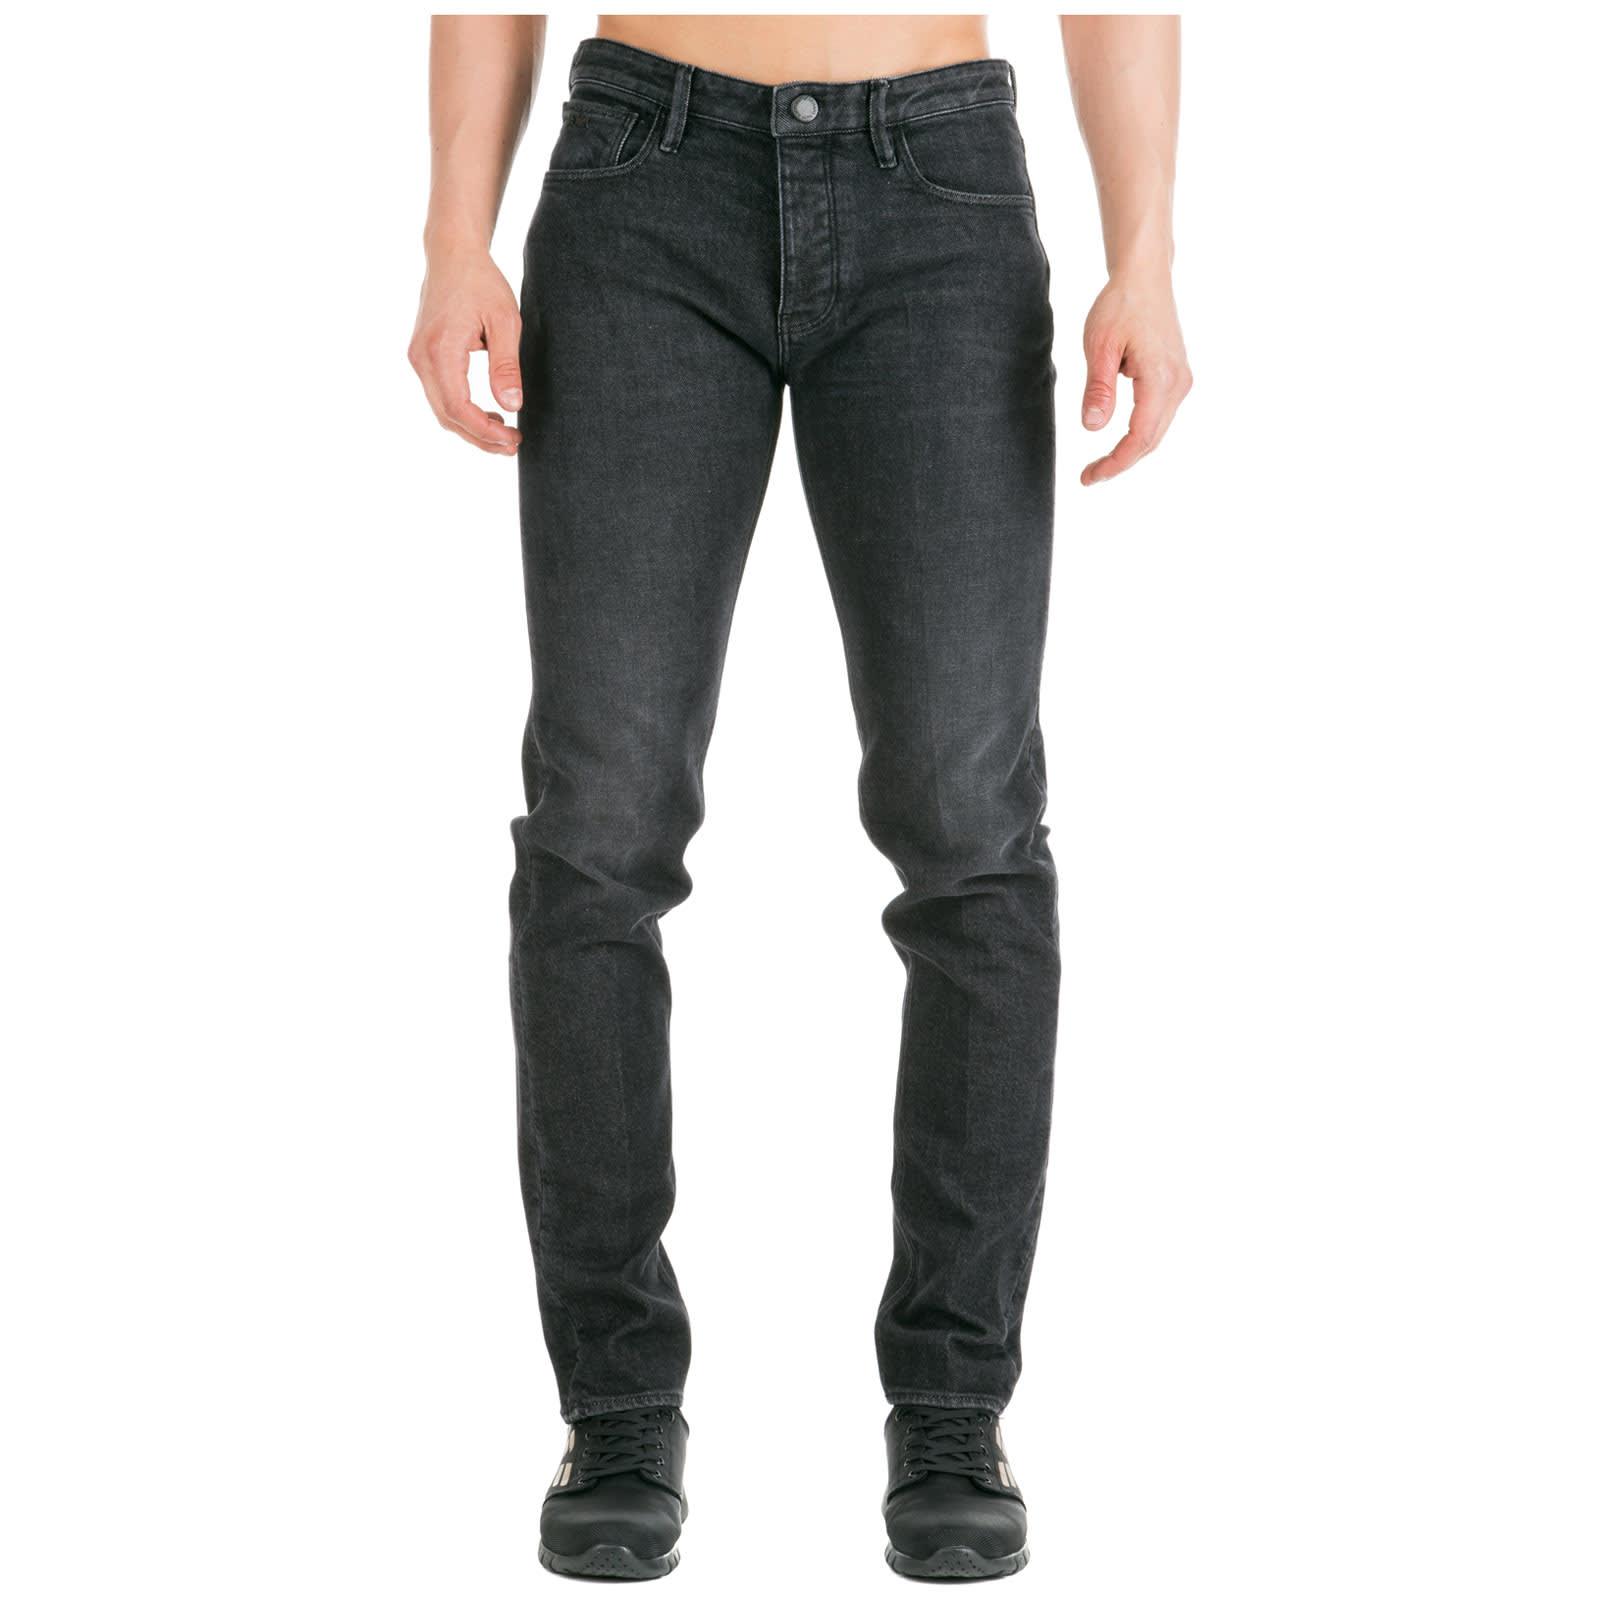 9b32442d62 Emporio Armani Jeans Denim